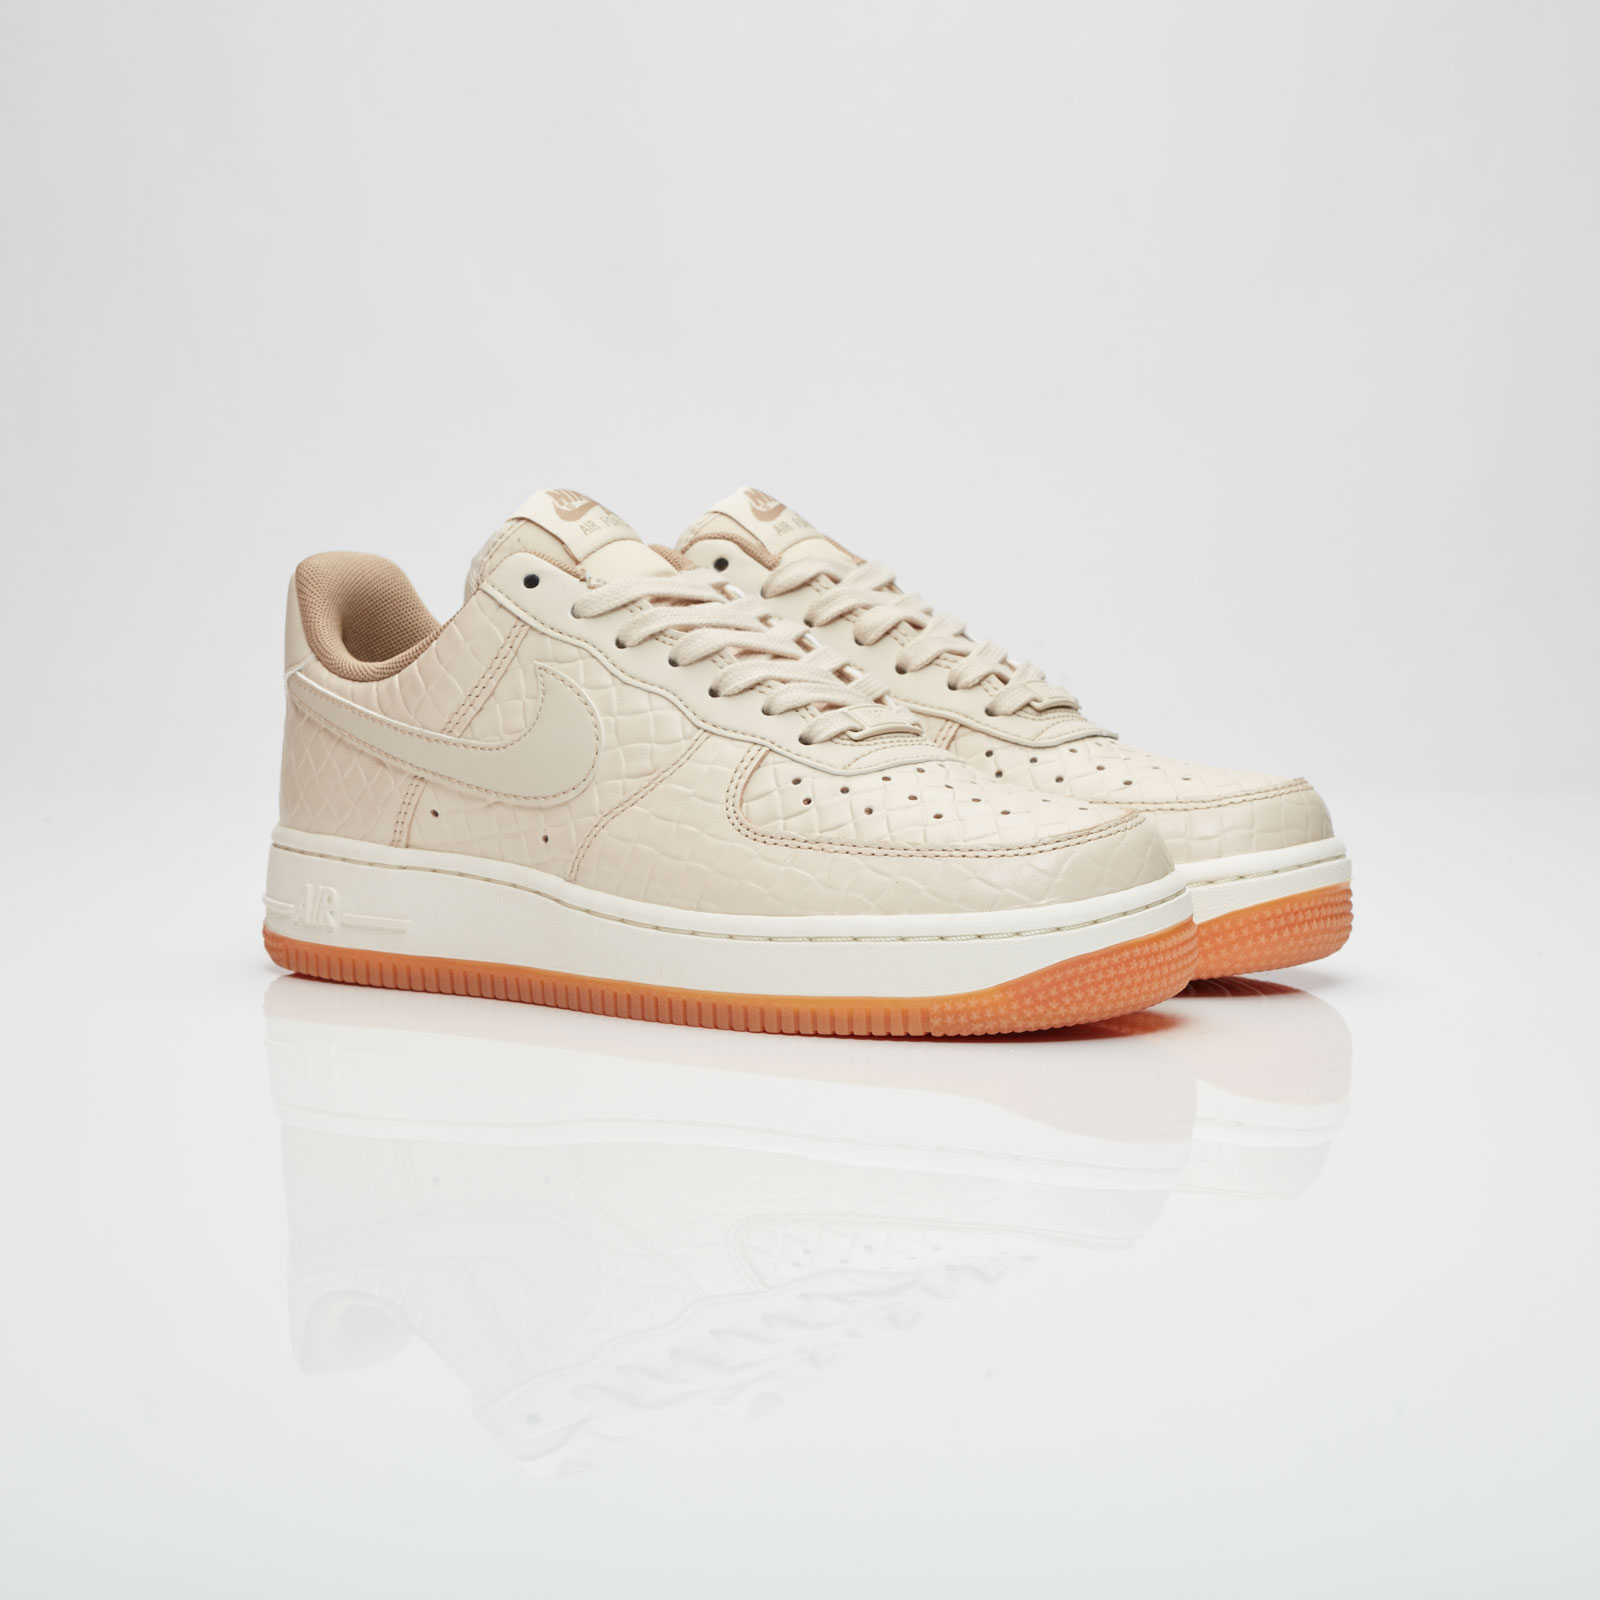 Nike Air Force 1 '07 Premium Womens 616725 112 Oatmeal Khaki